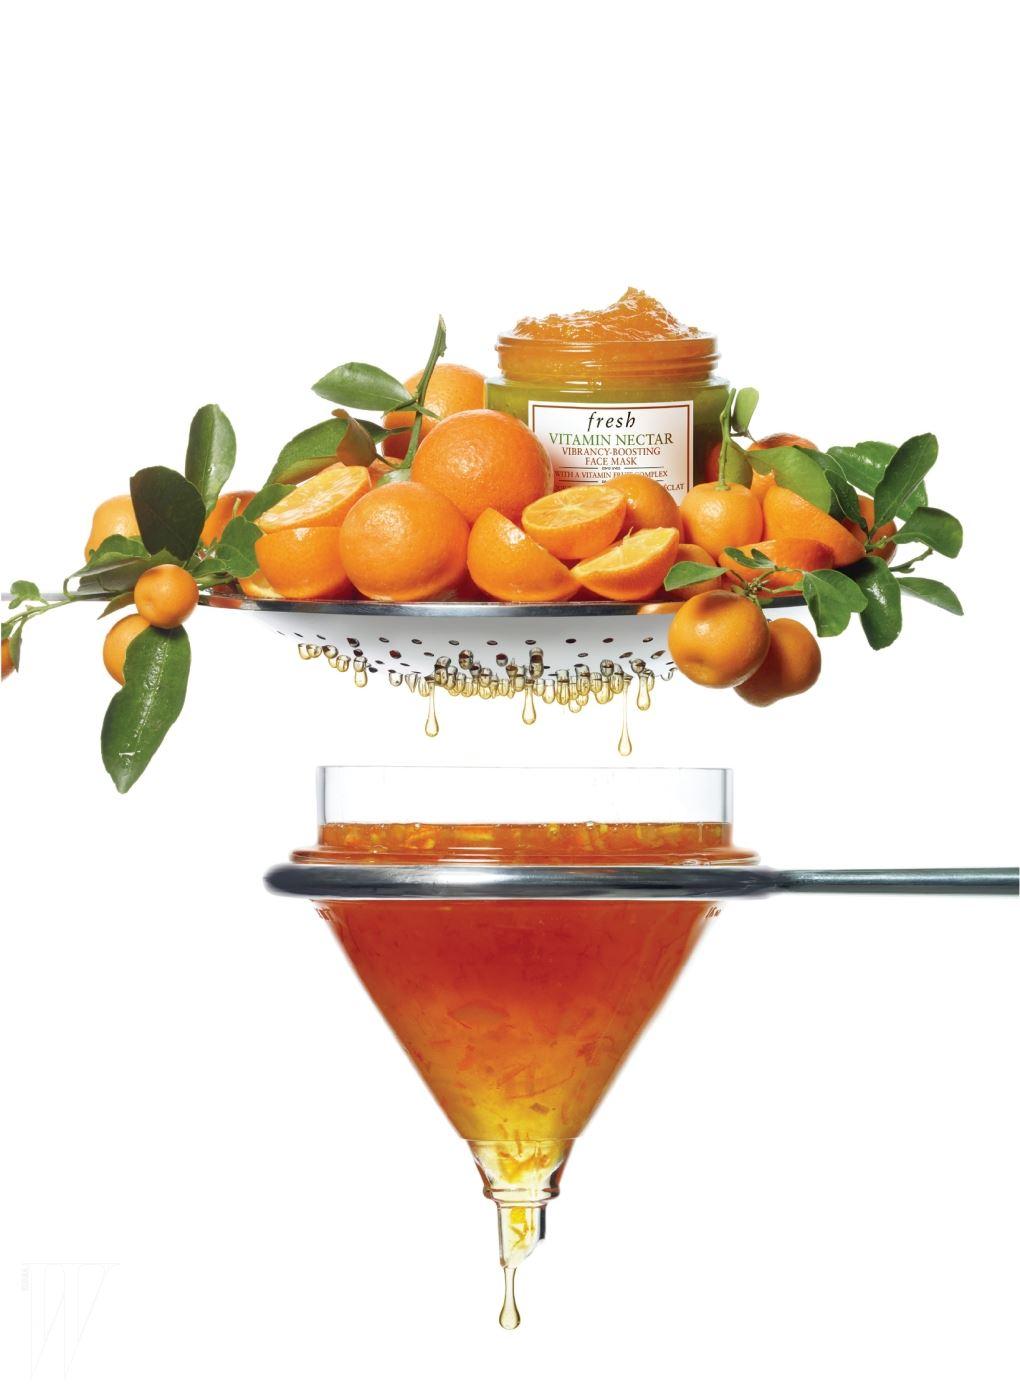 Fresh 바이타민 넥타 바이브런시- 부스팅 페이스 마스크